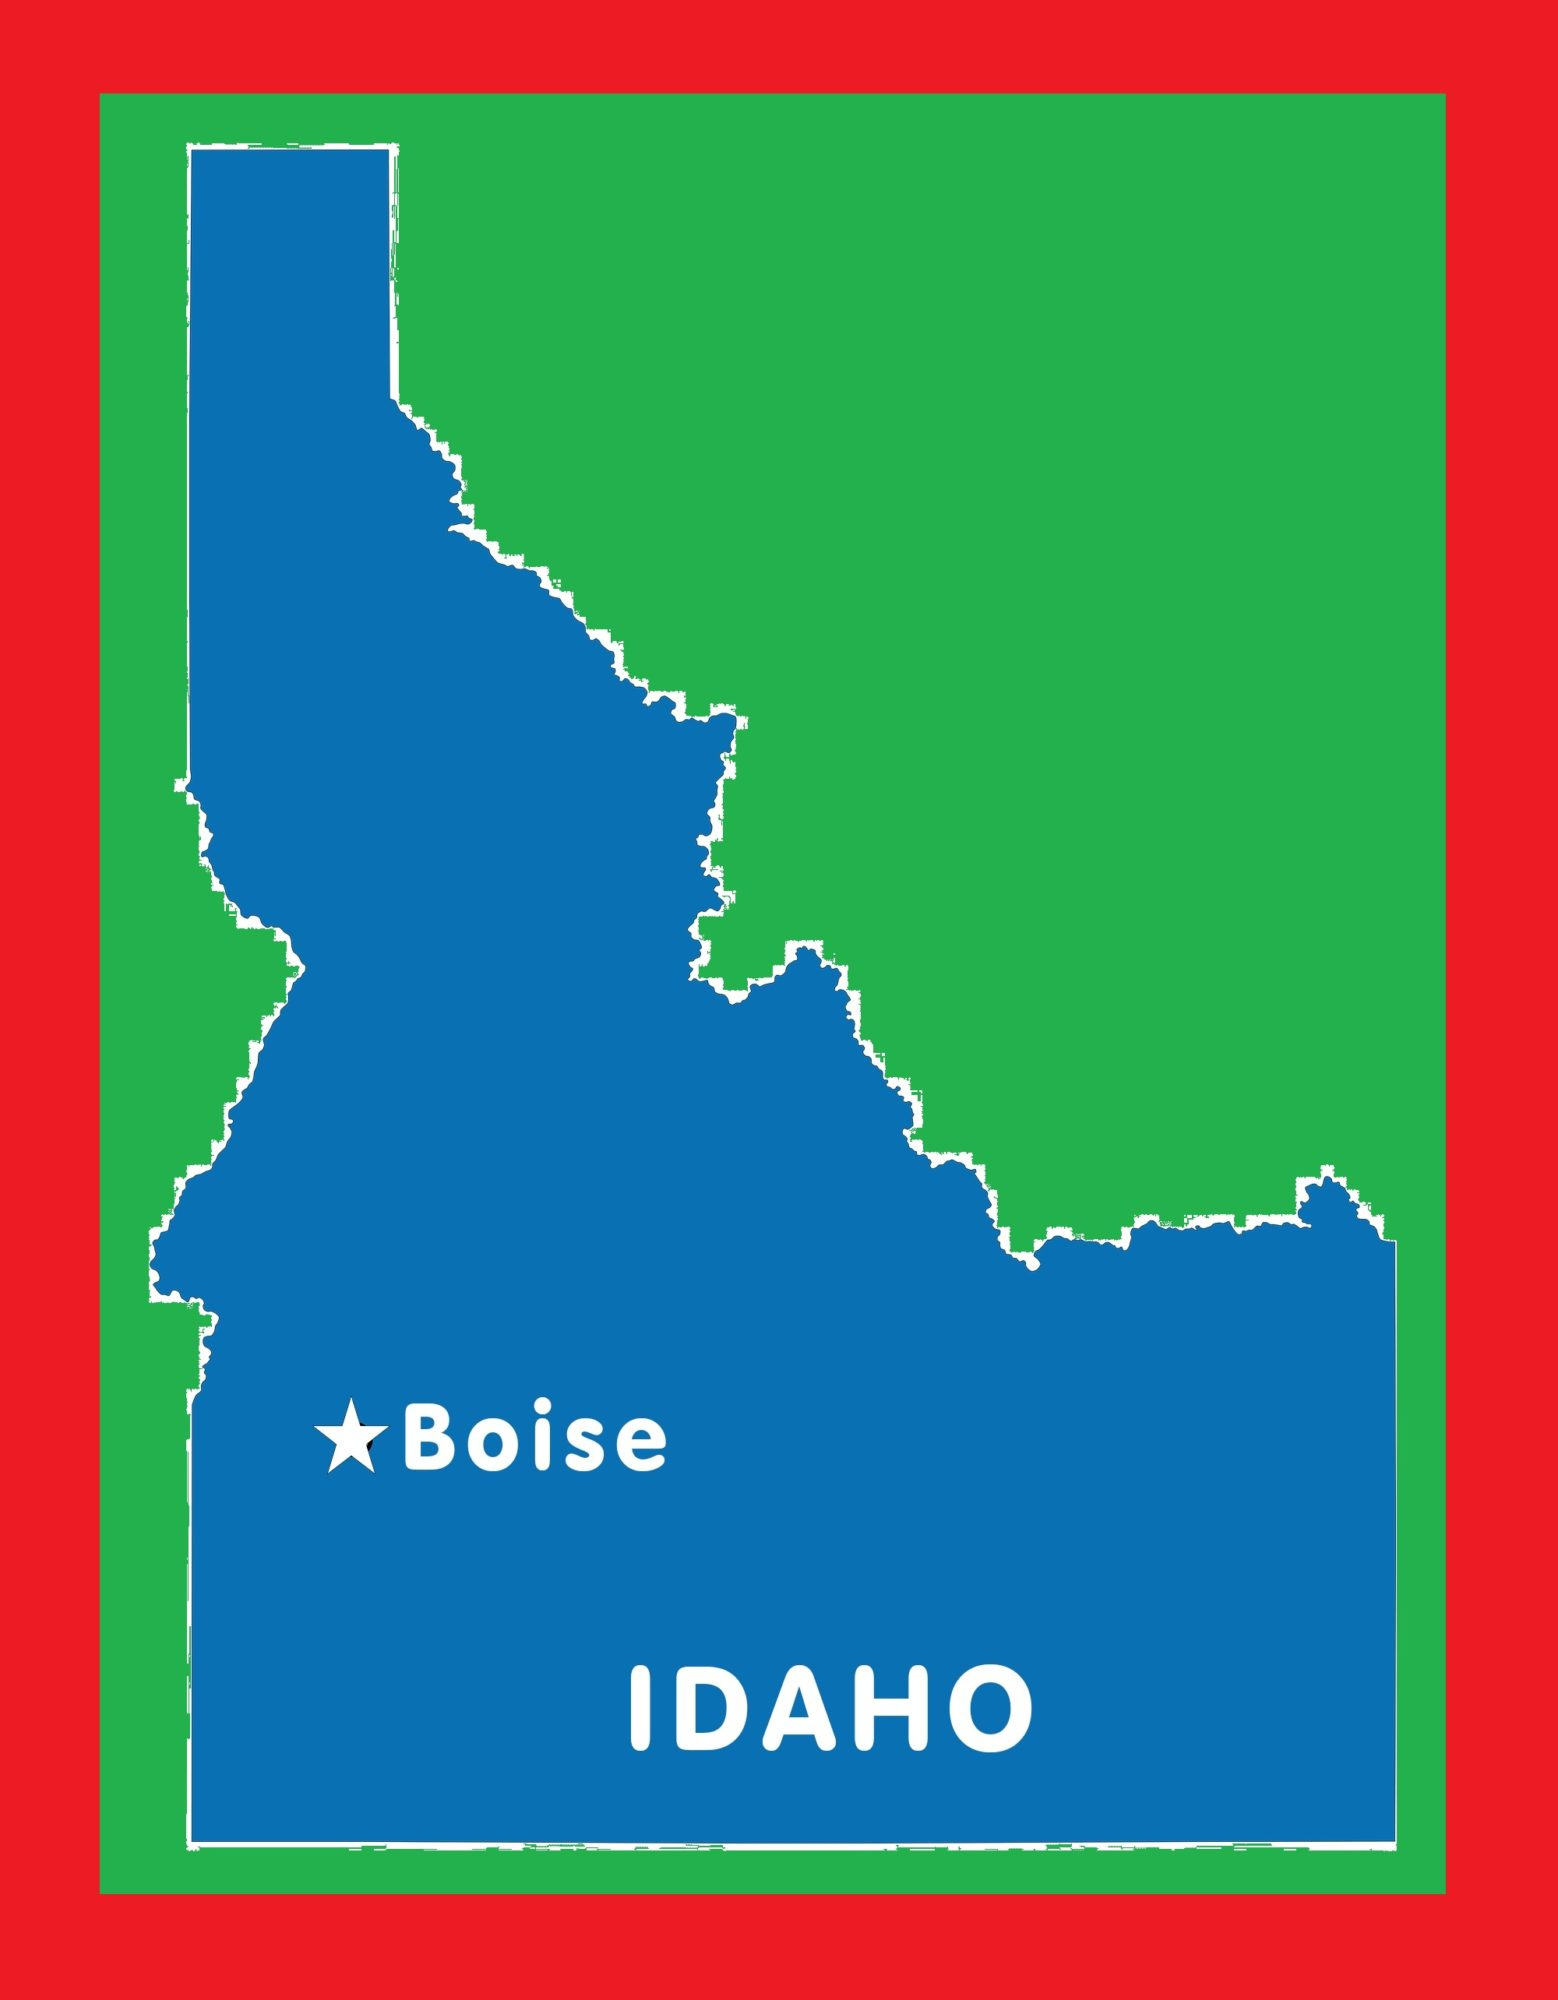 Idaho Capital Map | Large Printable and Standard Map 4